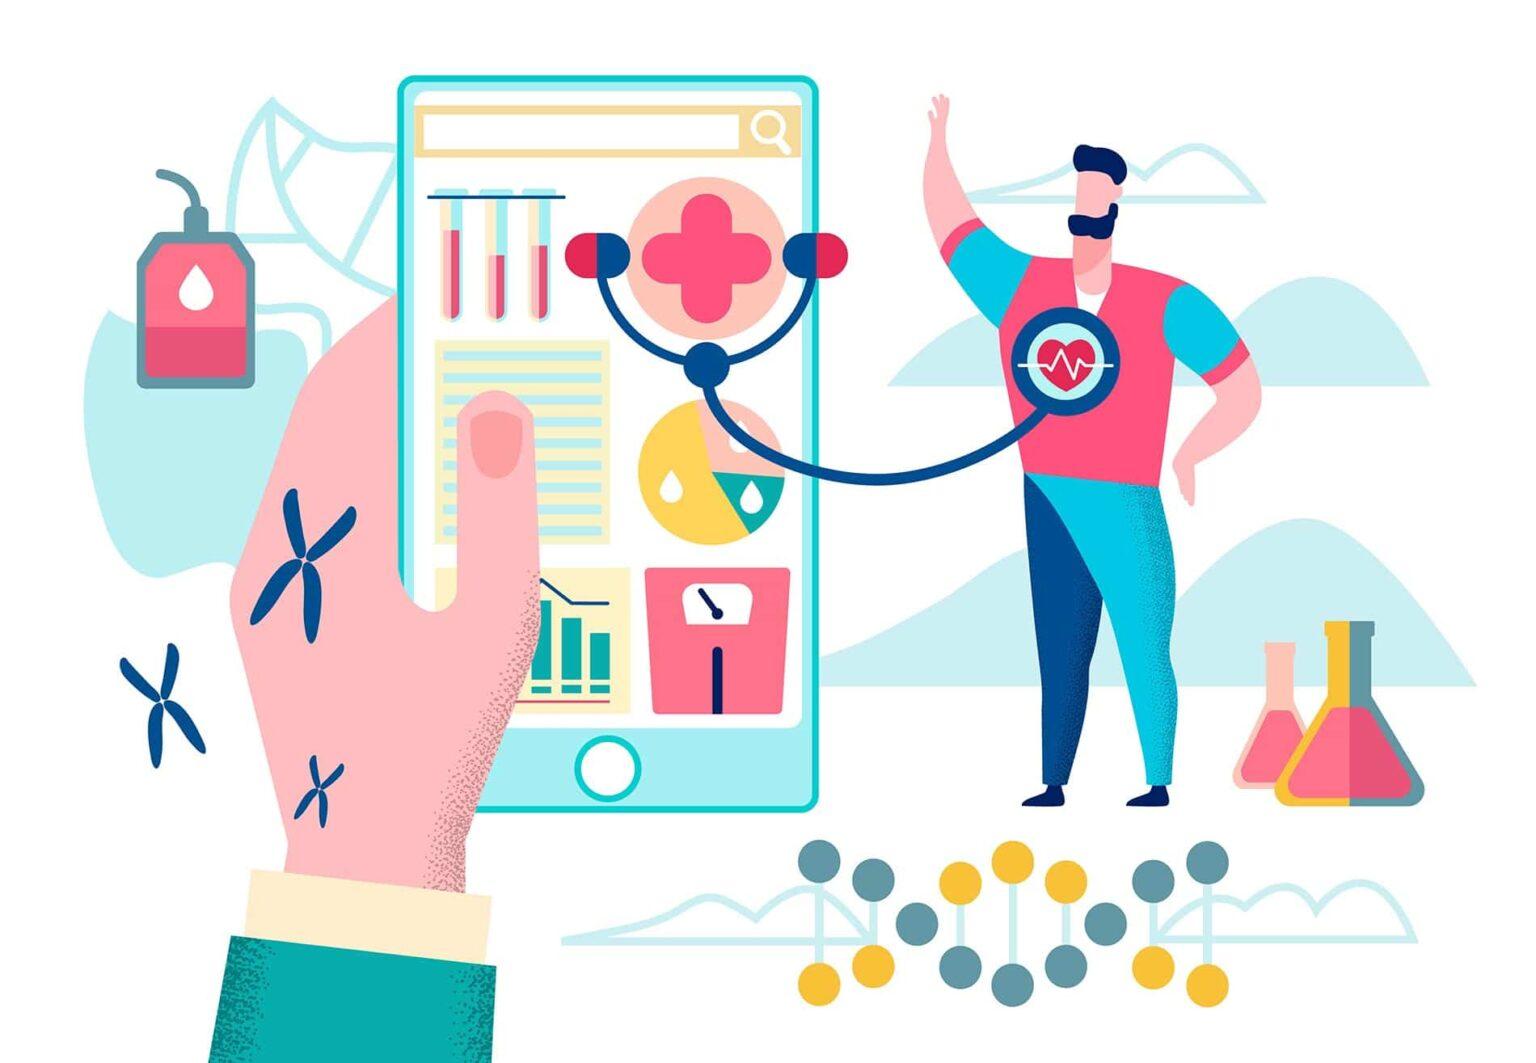 Online doctor consultation - Healthcare IoT